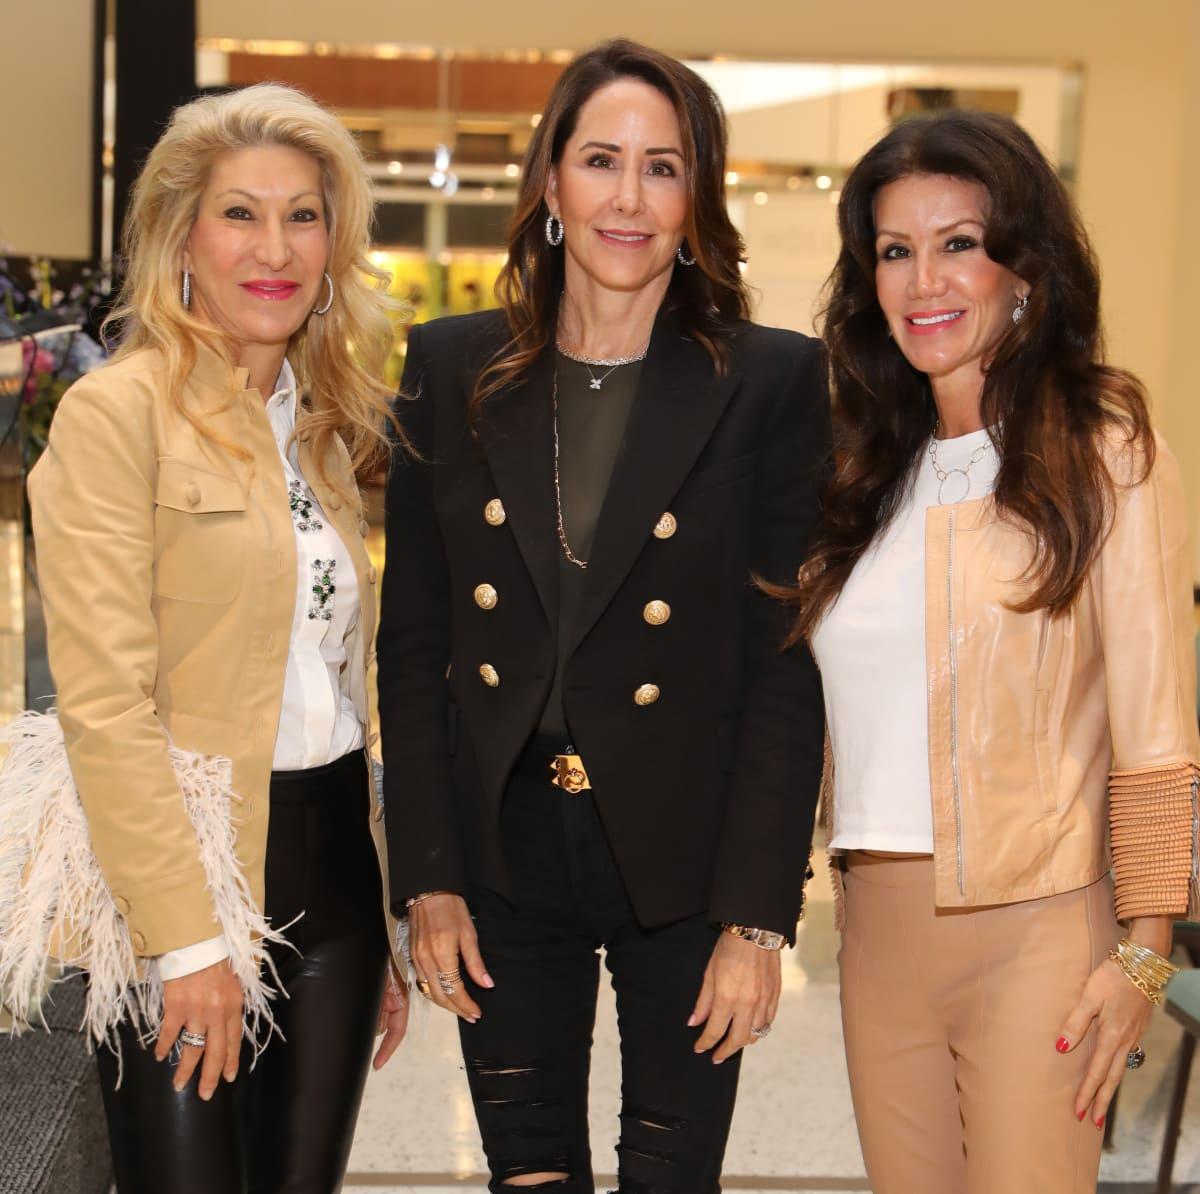 Houston, Decorative Center Houston Fall Market, November 2017, Rosemary Roth, Liz Glanville, Paula Fyhr